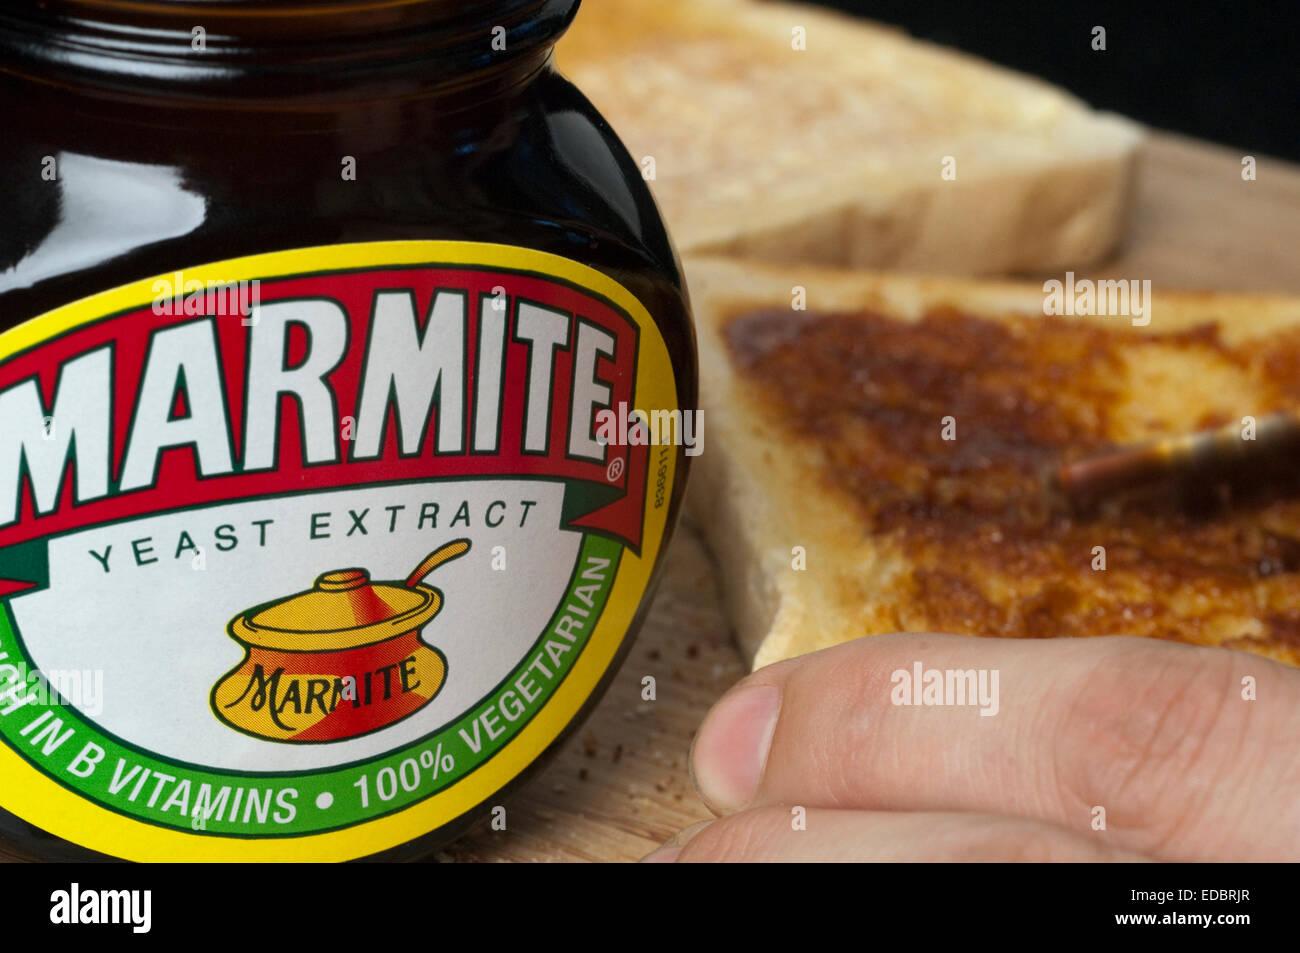 Illustrative image of Marmite, a Unilever food product. - Stock Image